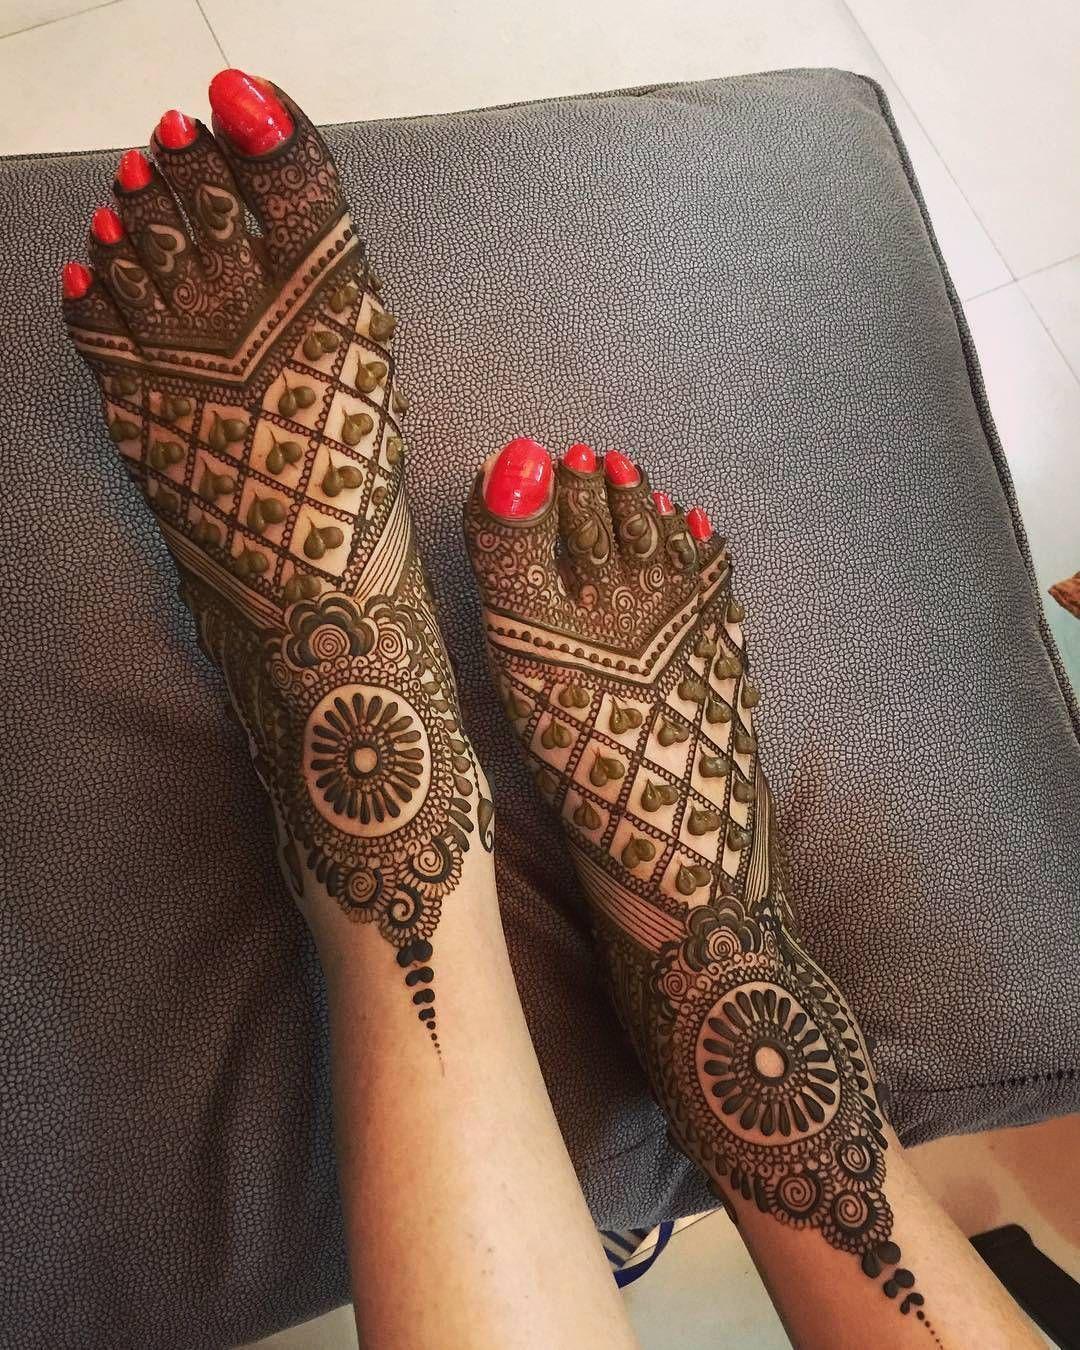 PunjabKesari, Latest Mehndi Designs for Foot, लेटेस्ट  मेहंदी डिज़ाइन फॉर फुट